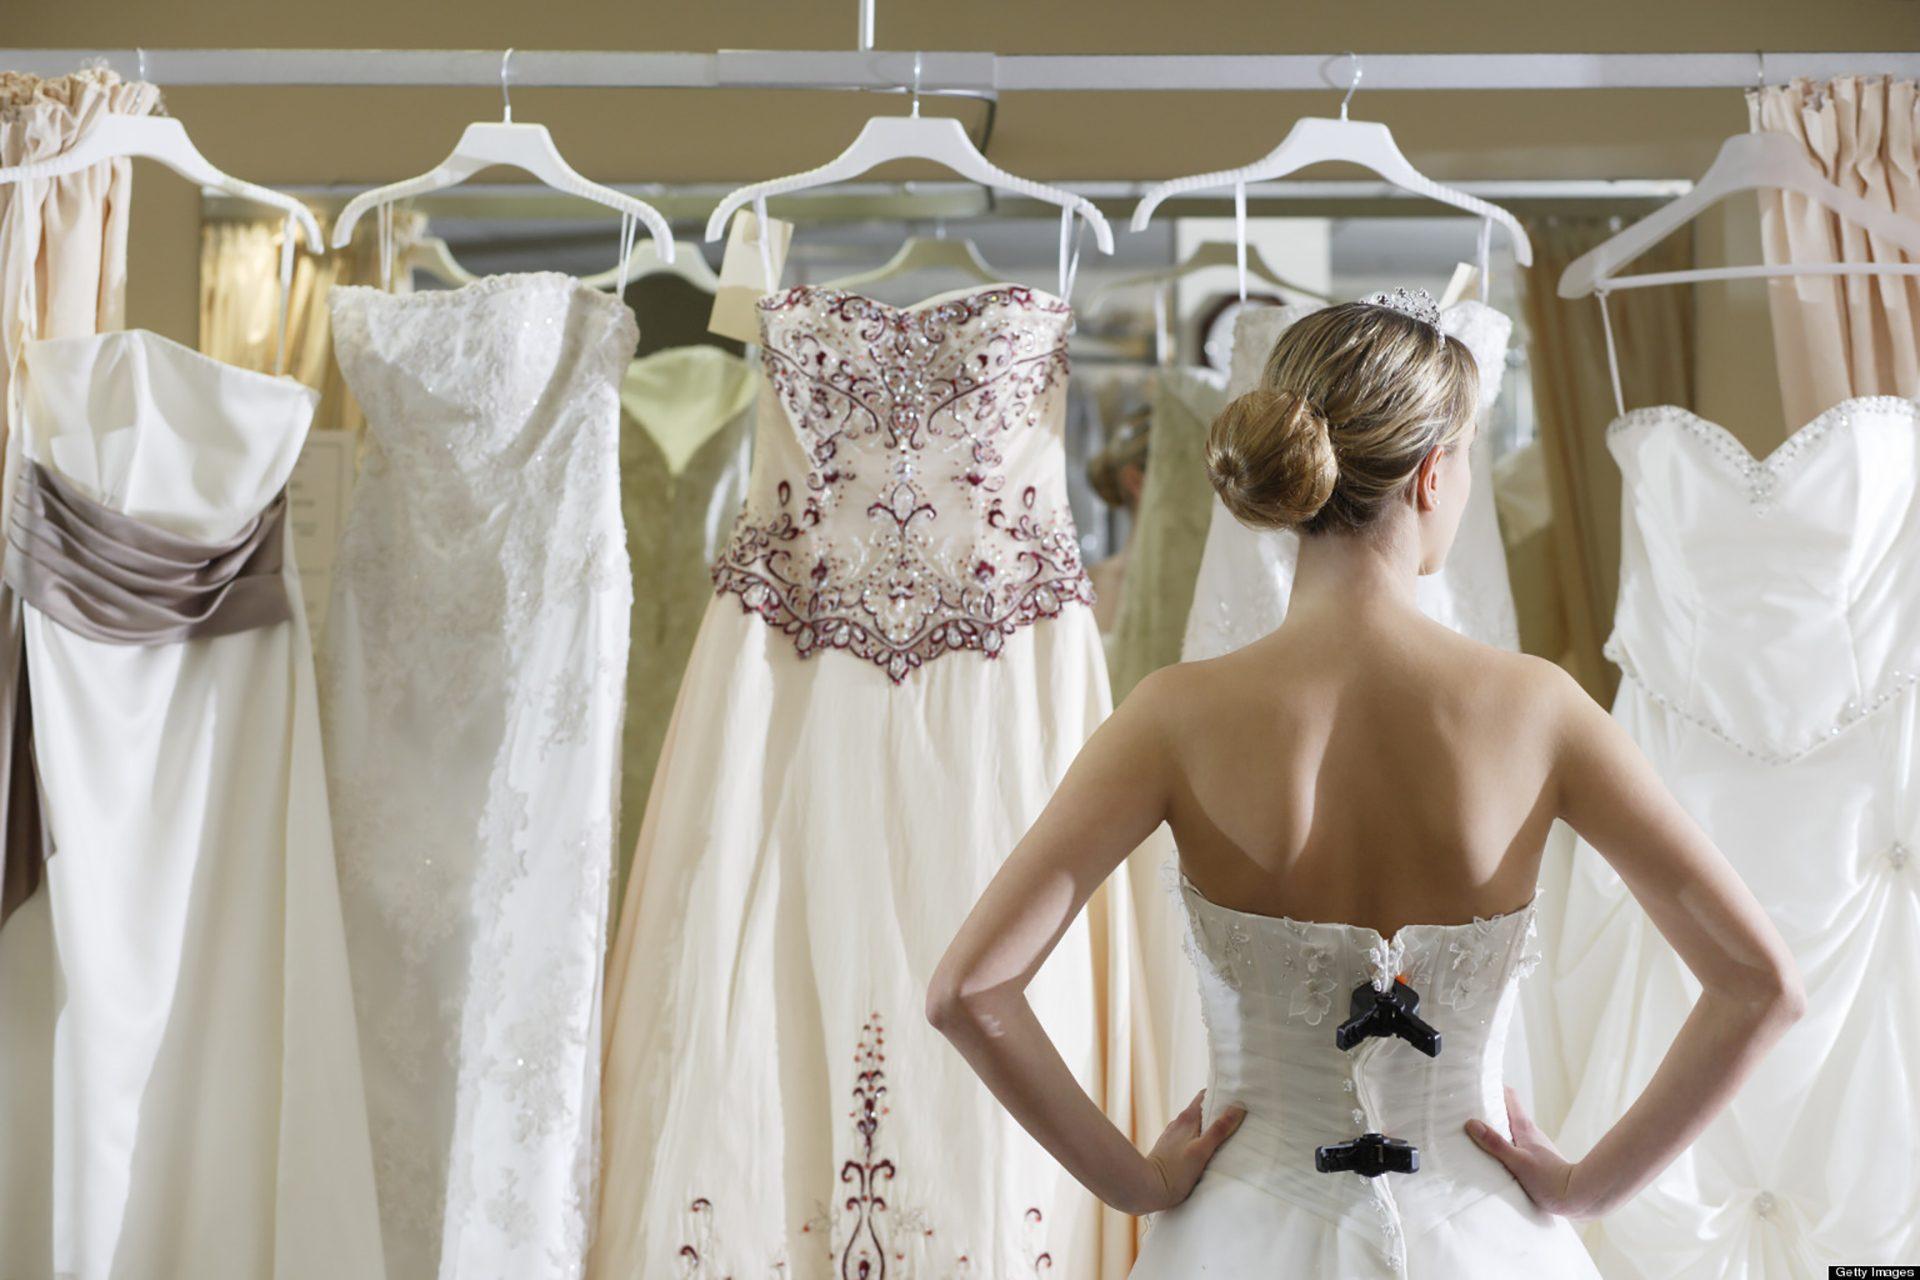 ghid rapid alegere haine nunta